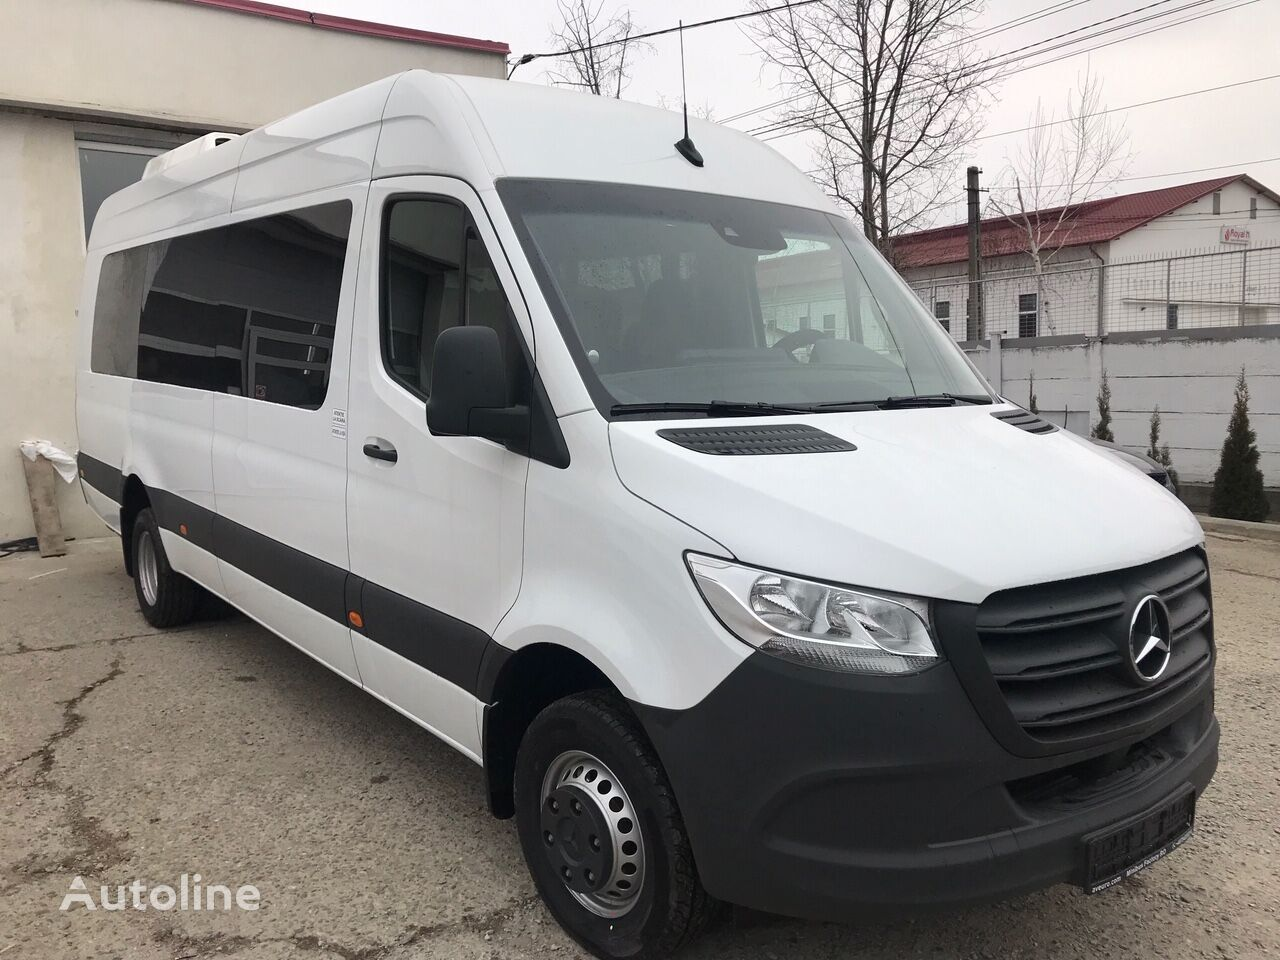 minibus de passager MERCEDES-BENZ Sprinter 516 neuf